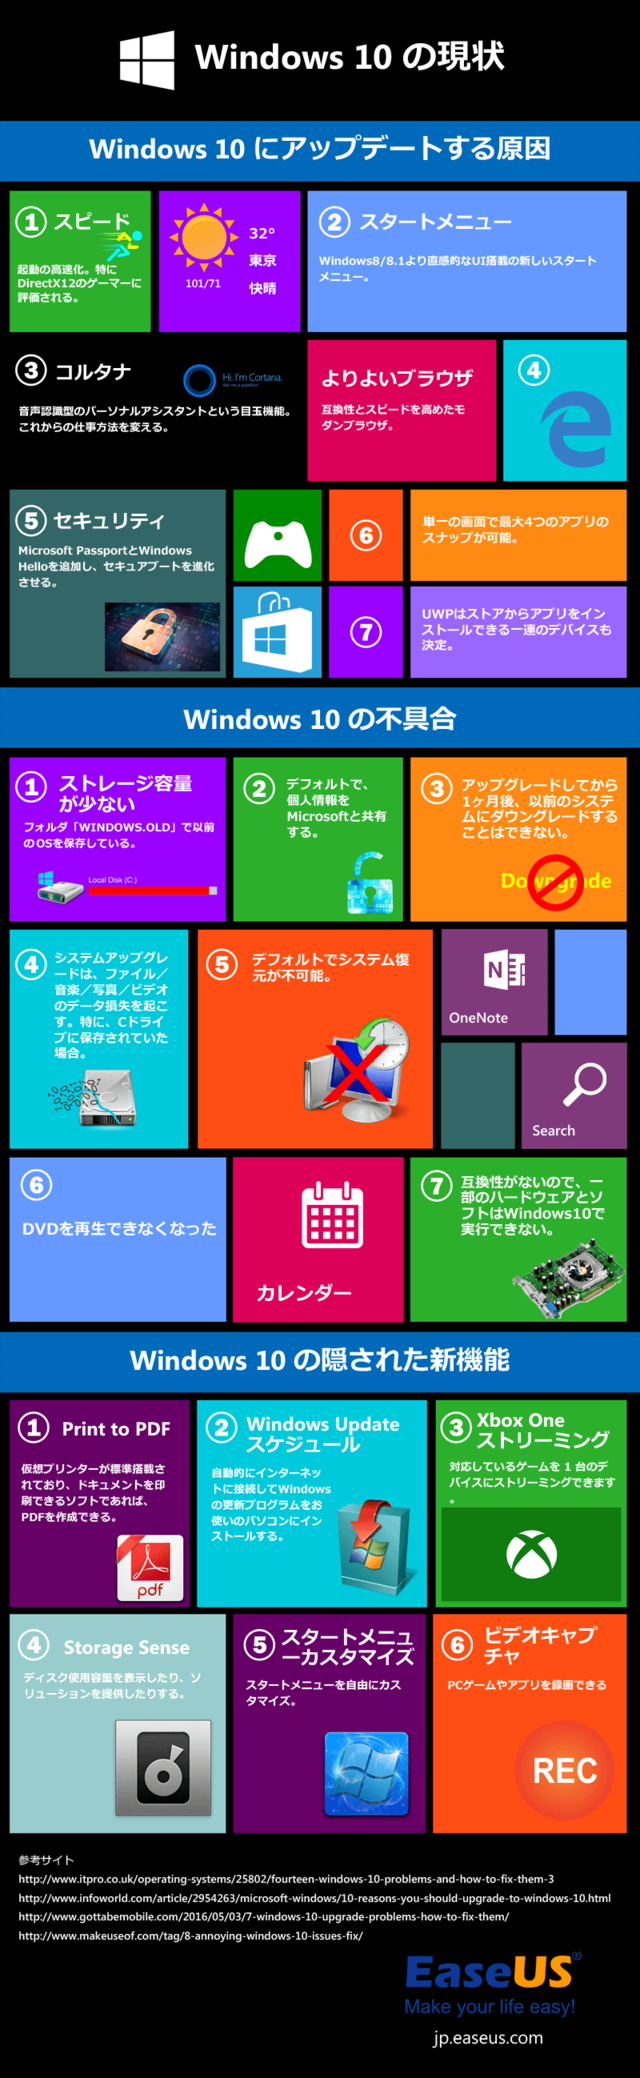 Windows 10 tips and tricks   jp